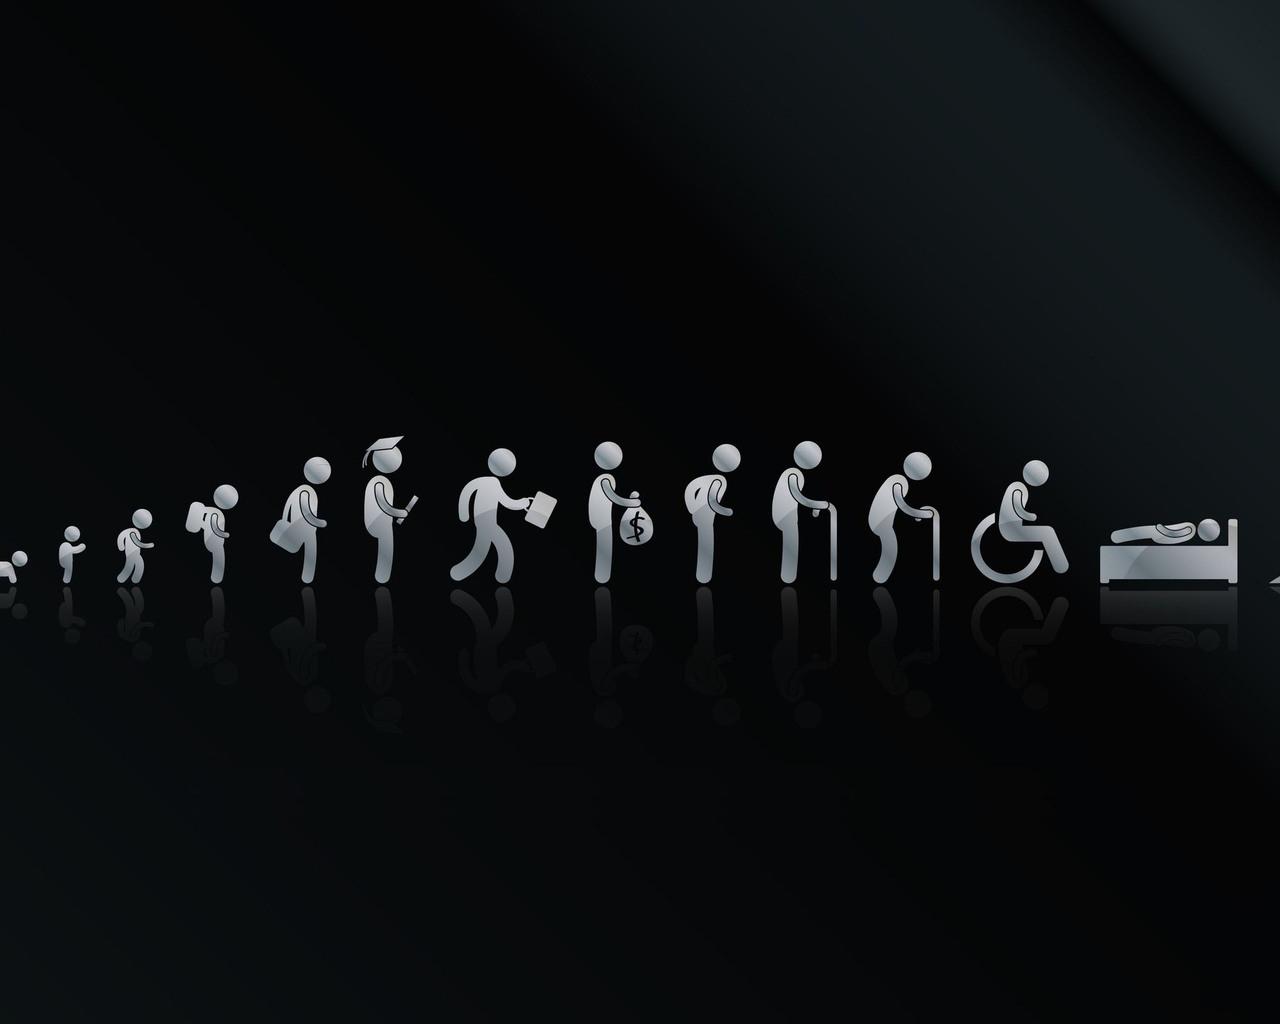 life-cycle-artwork-sd.jpg